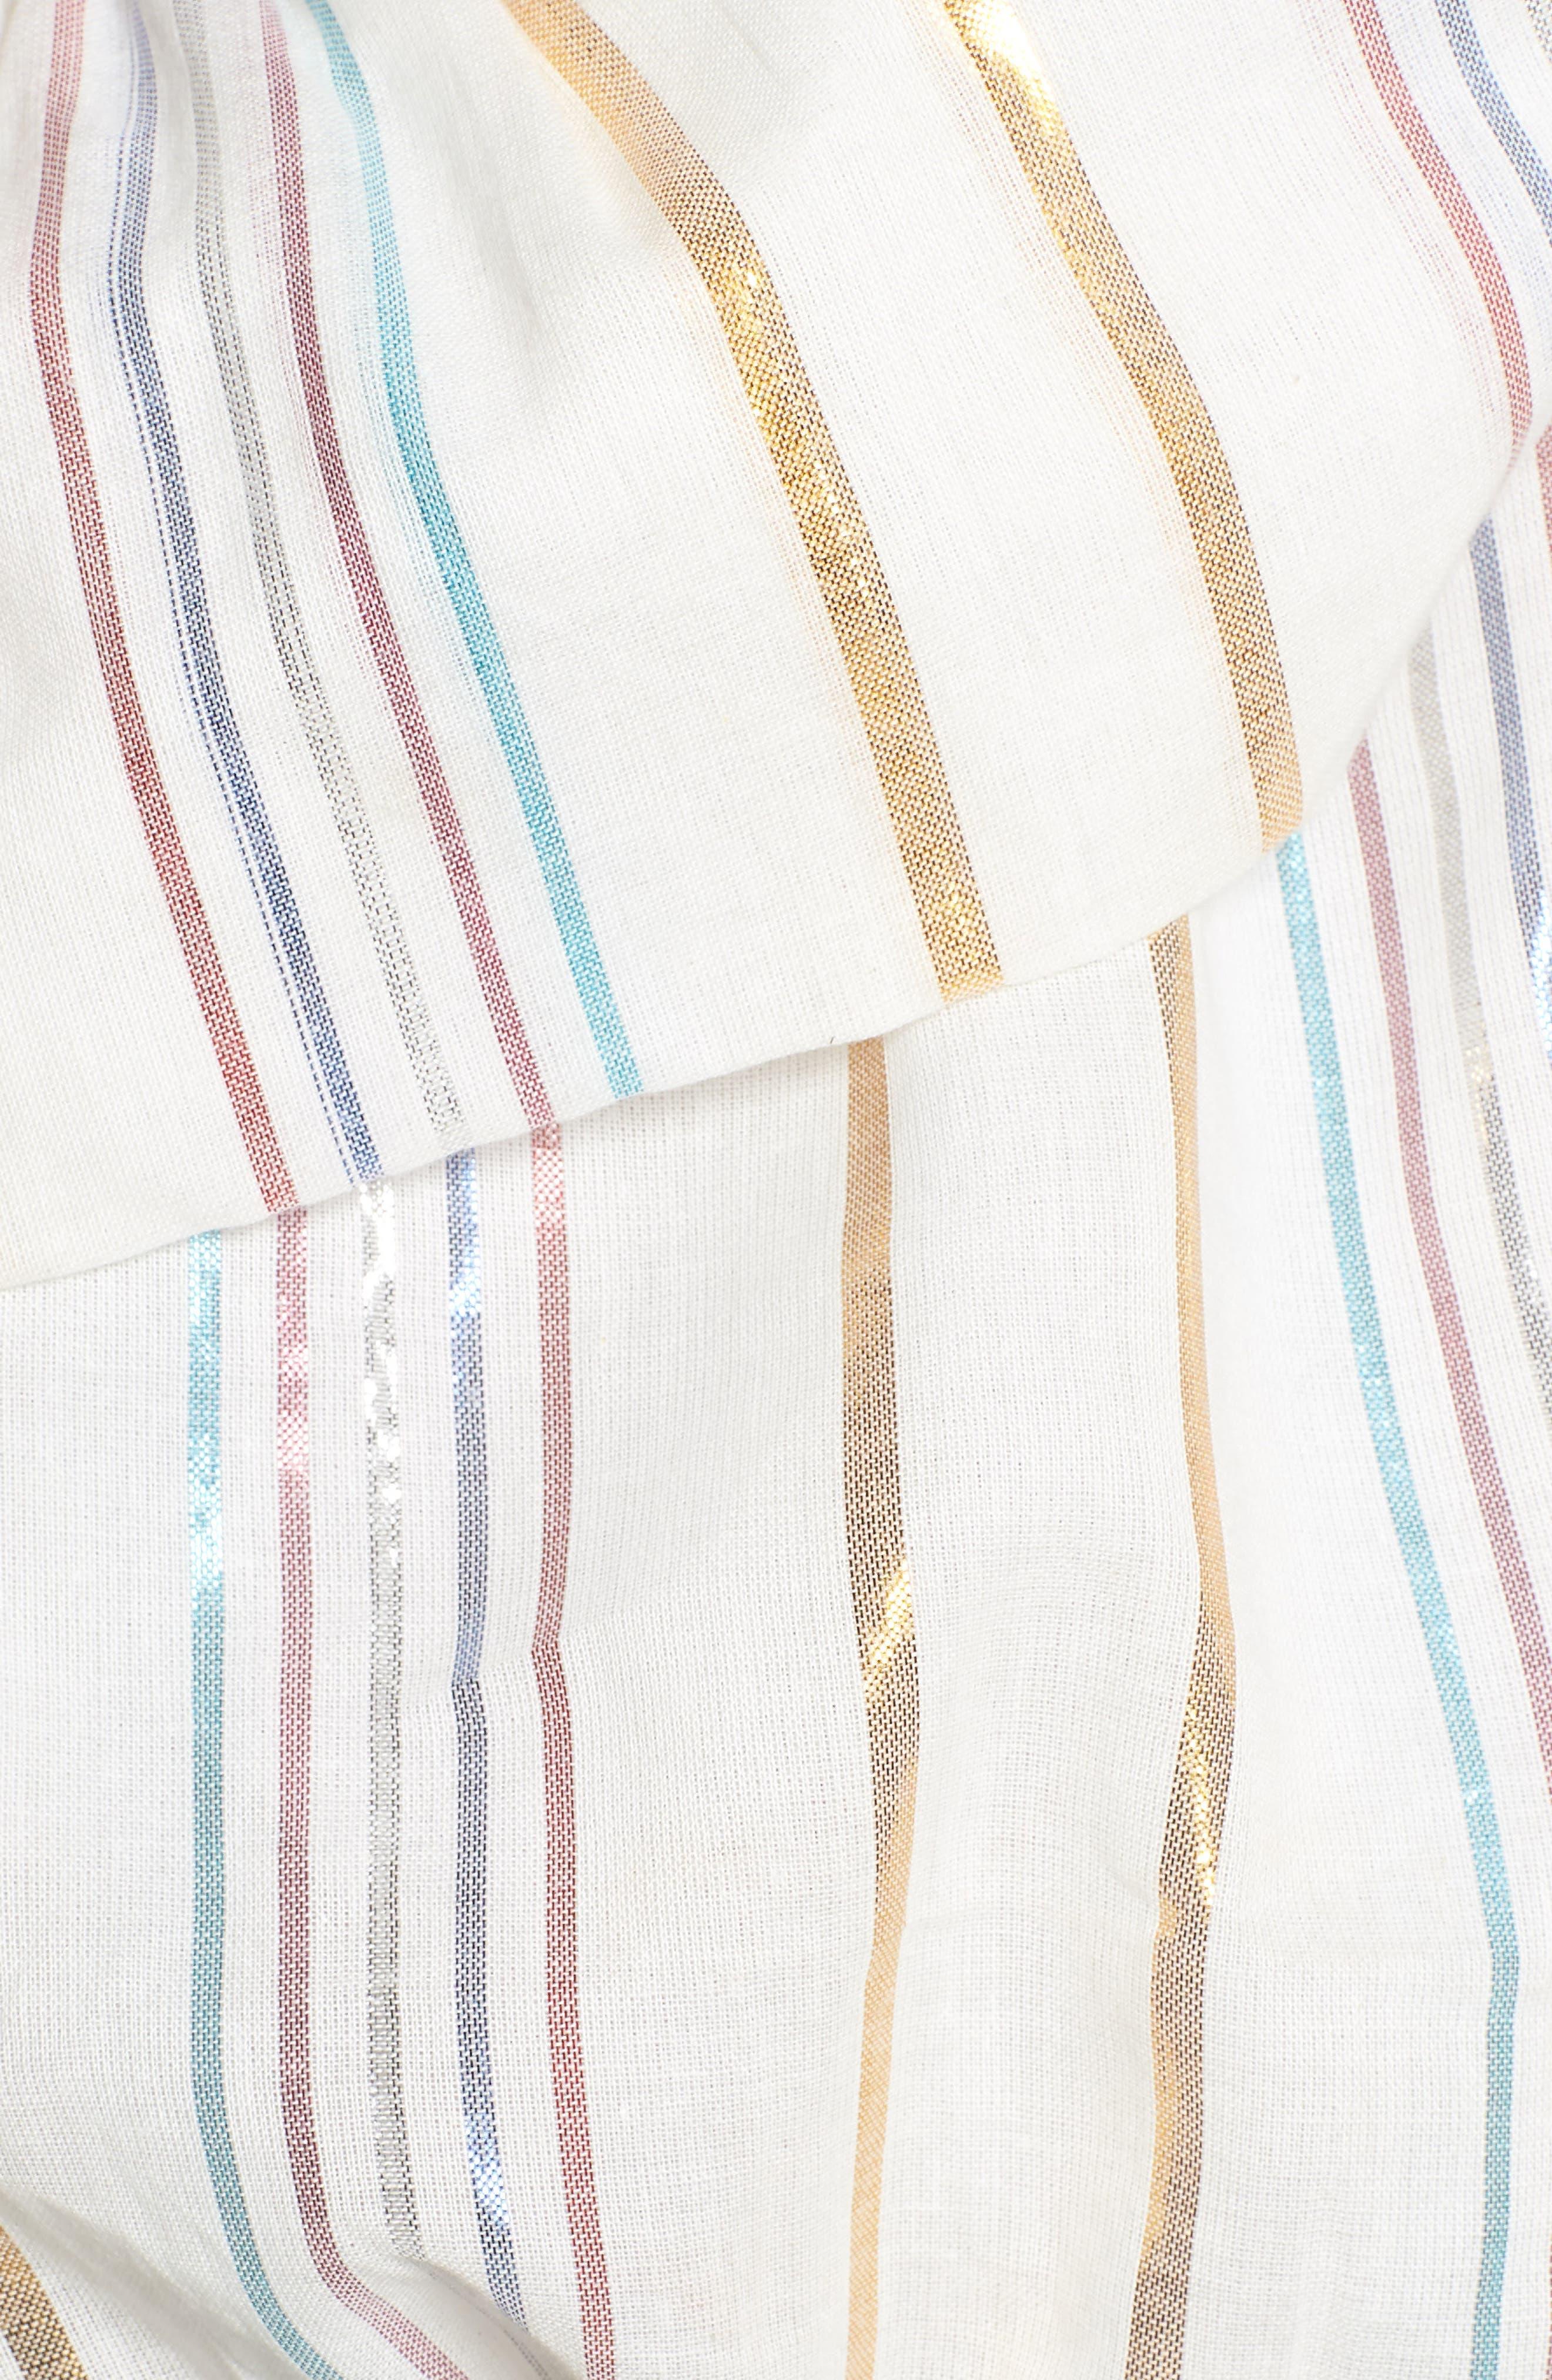 Vanessa One-Shoulder Crop Top,                             Alternate thumbnail 6, color,                             Marshmallow